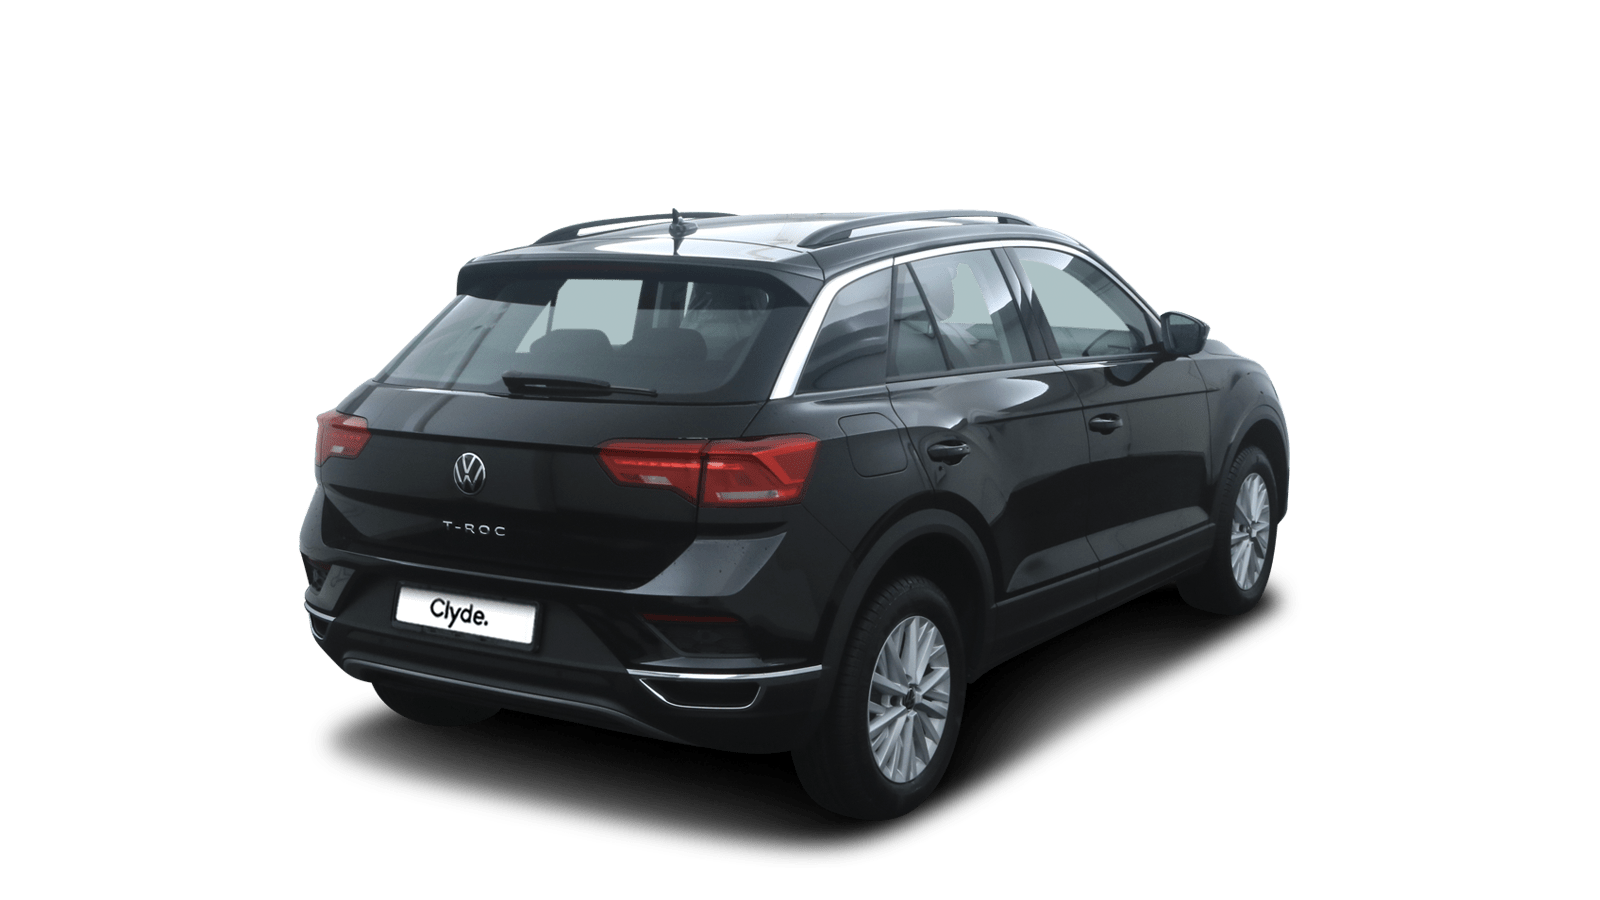 VW T-Roc Black back - Clyde car subscription